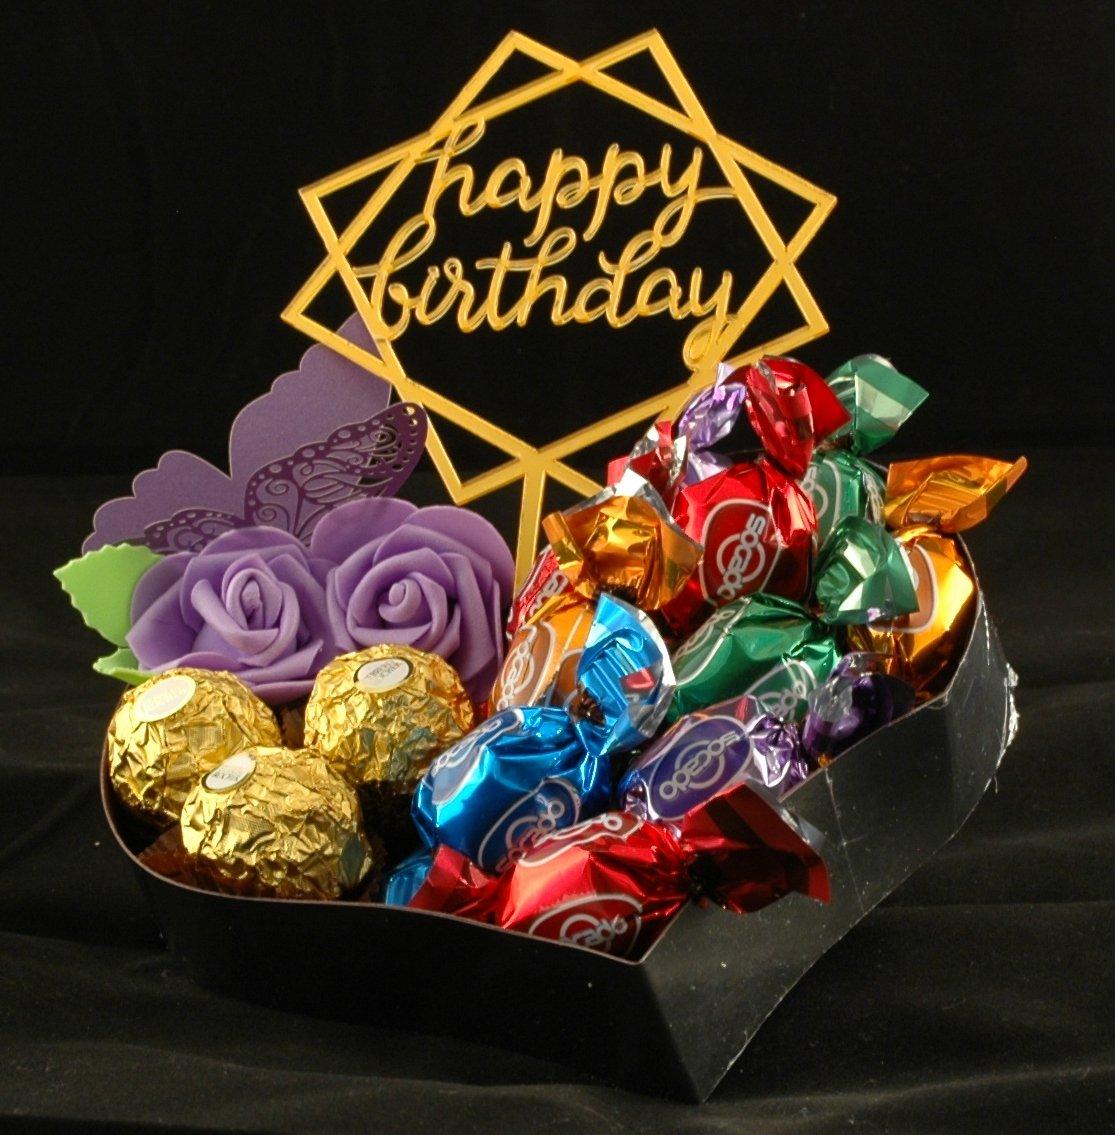 Delikate Hjerteform med sjokolade 24x25cm